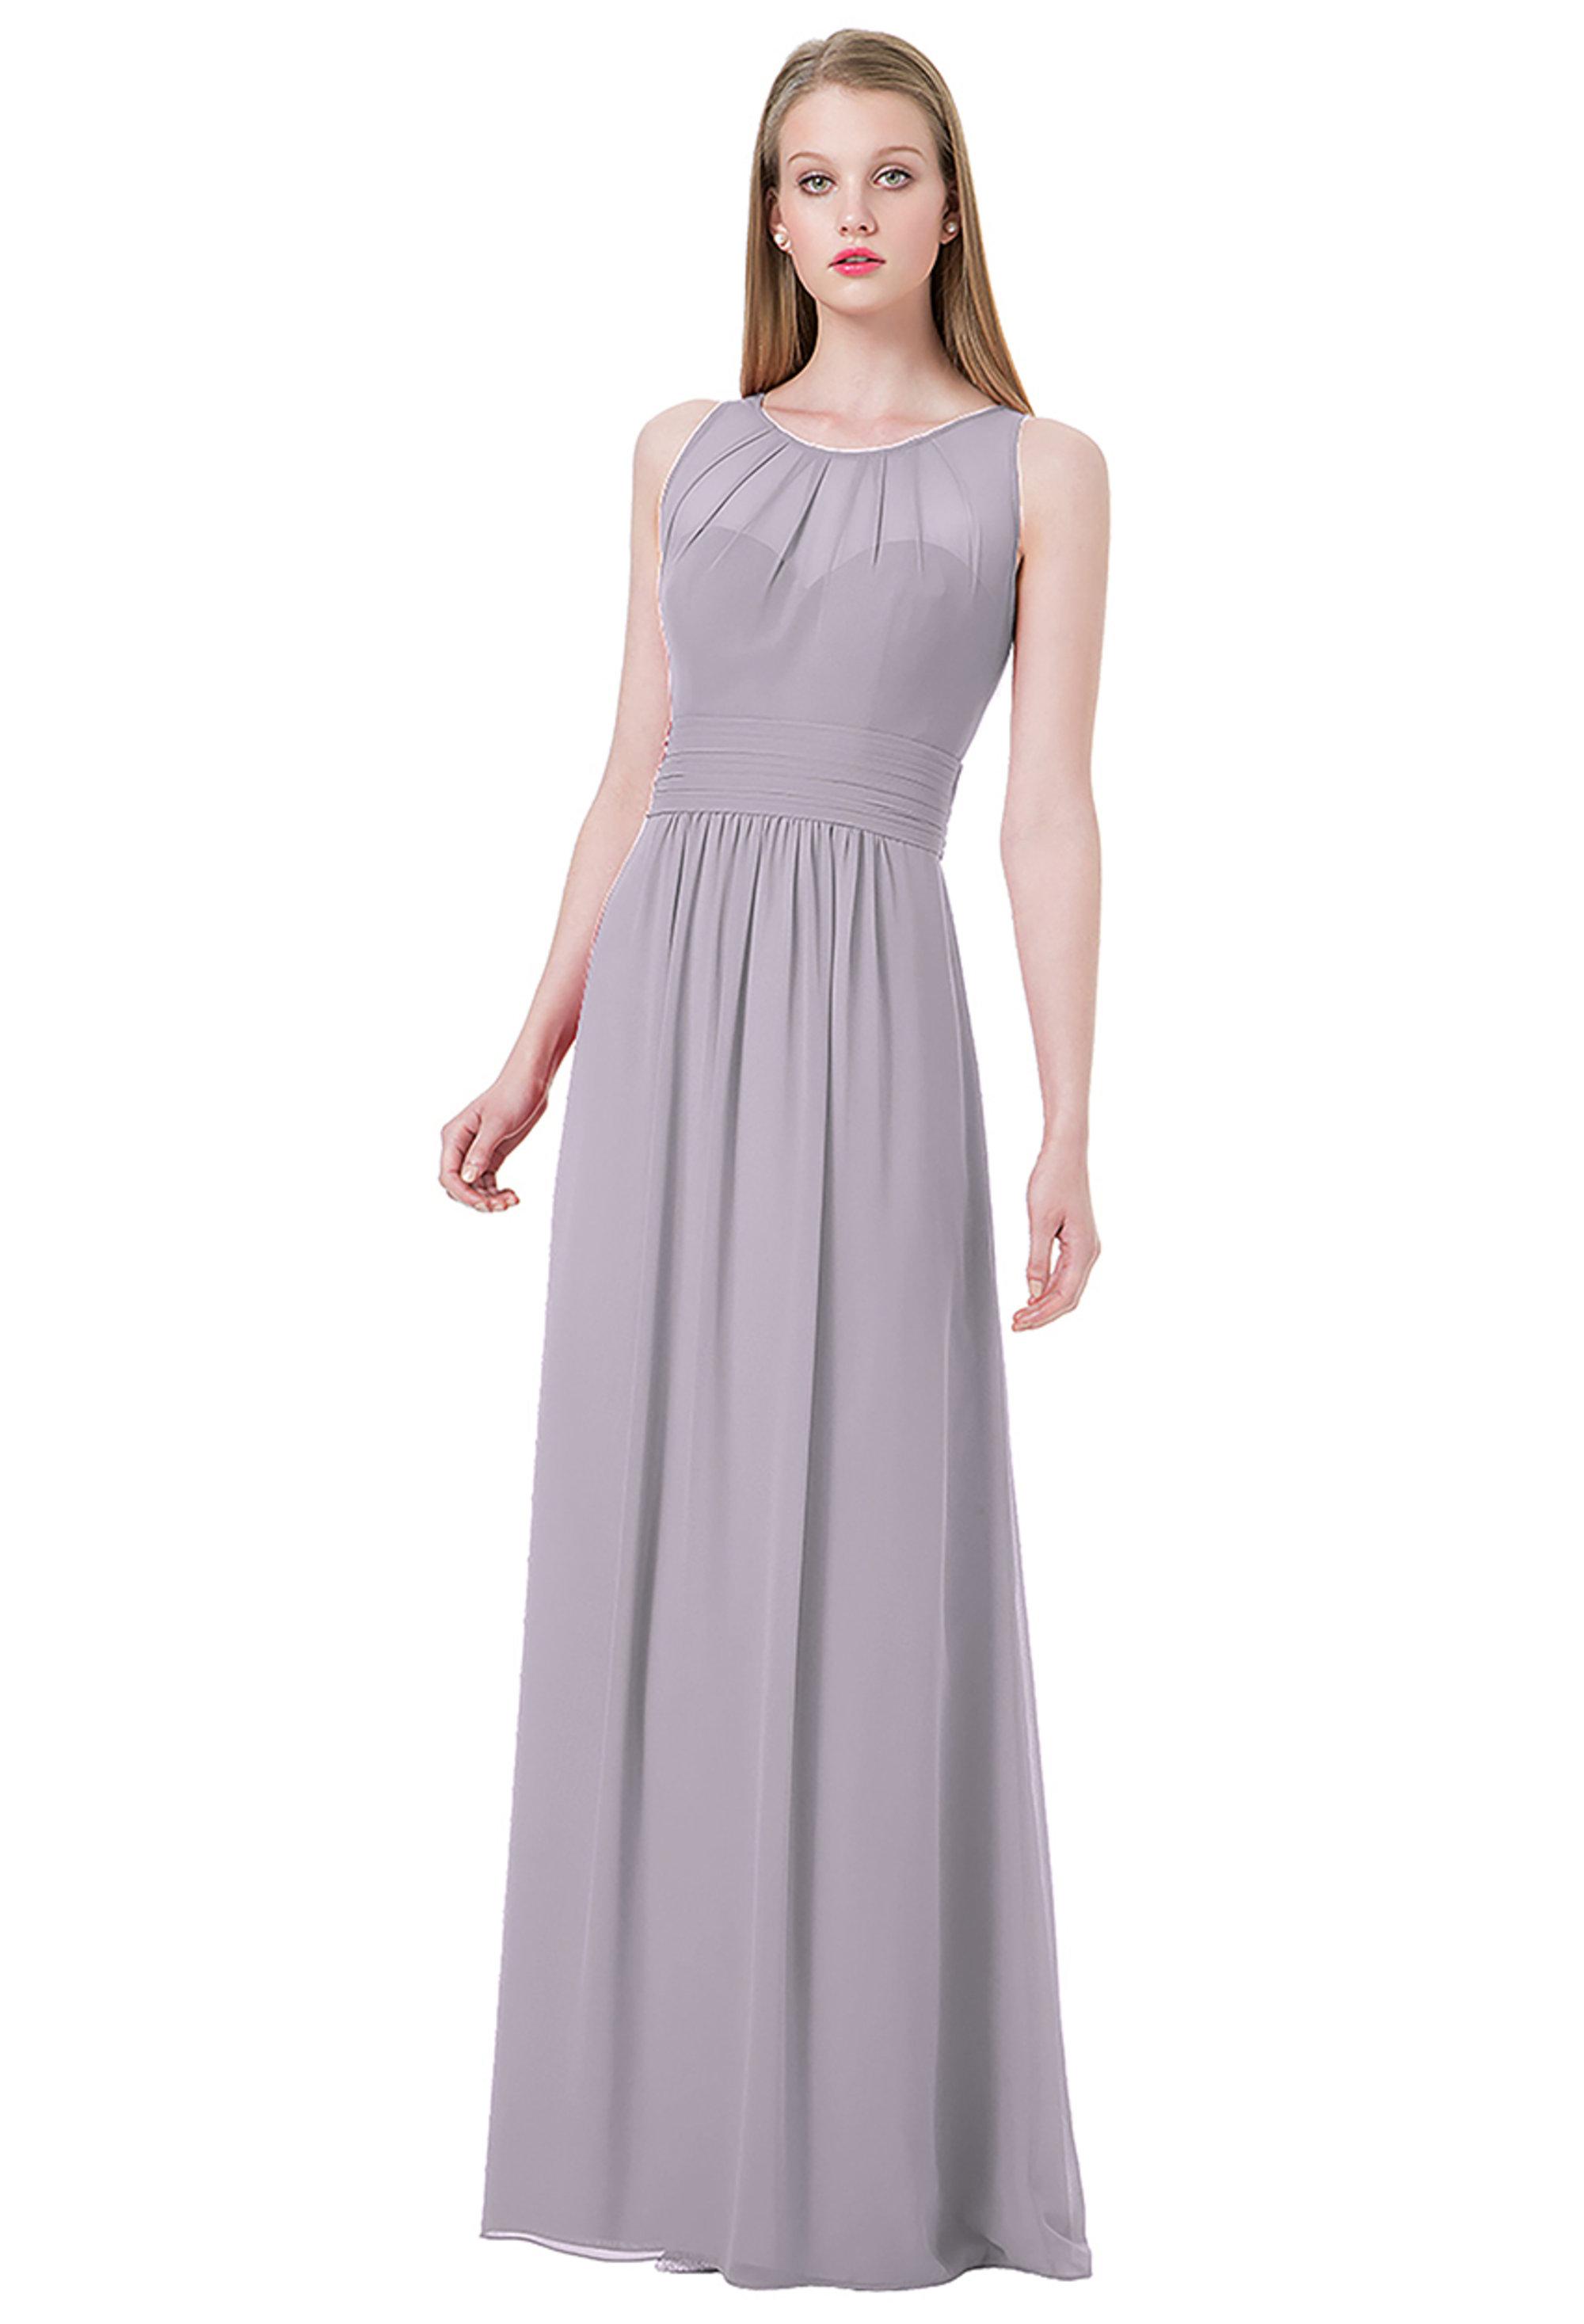 Bill Levkoff VIOLET Chiffon Jewel A-line gown, $220.00 Front